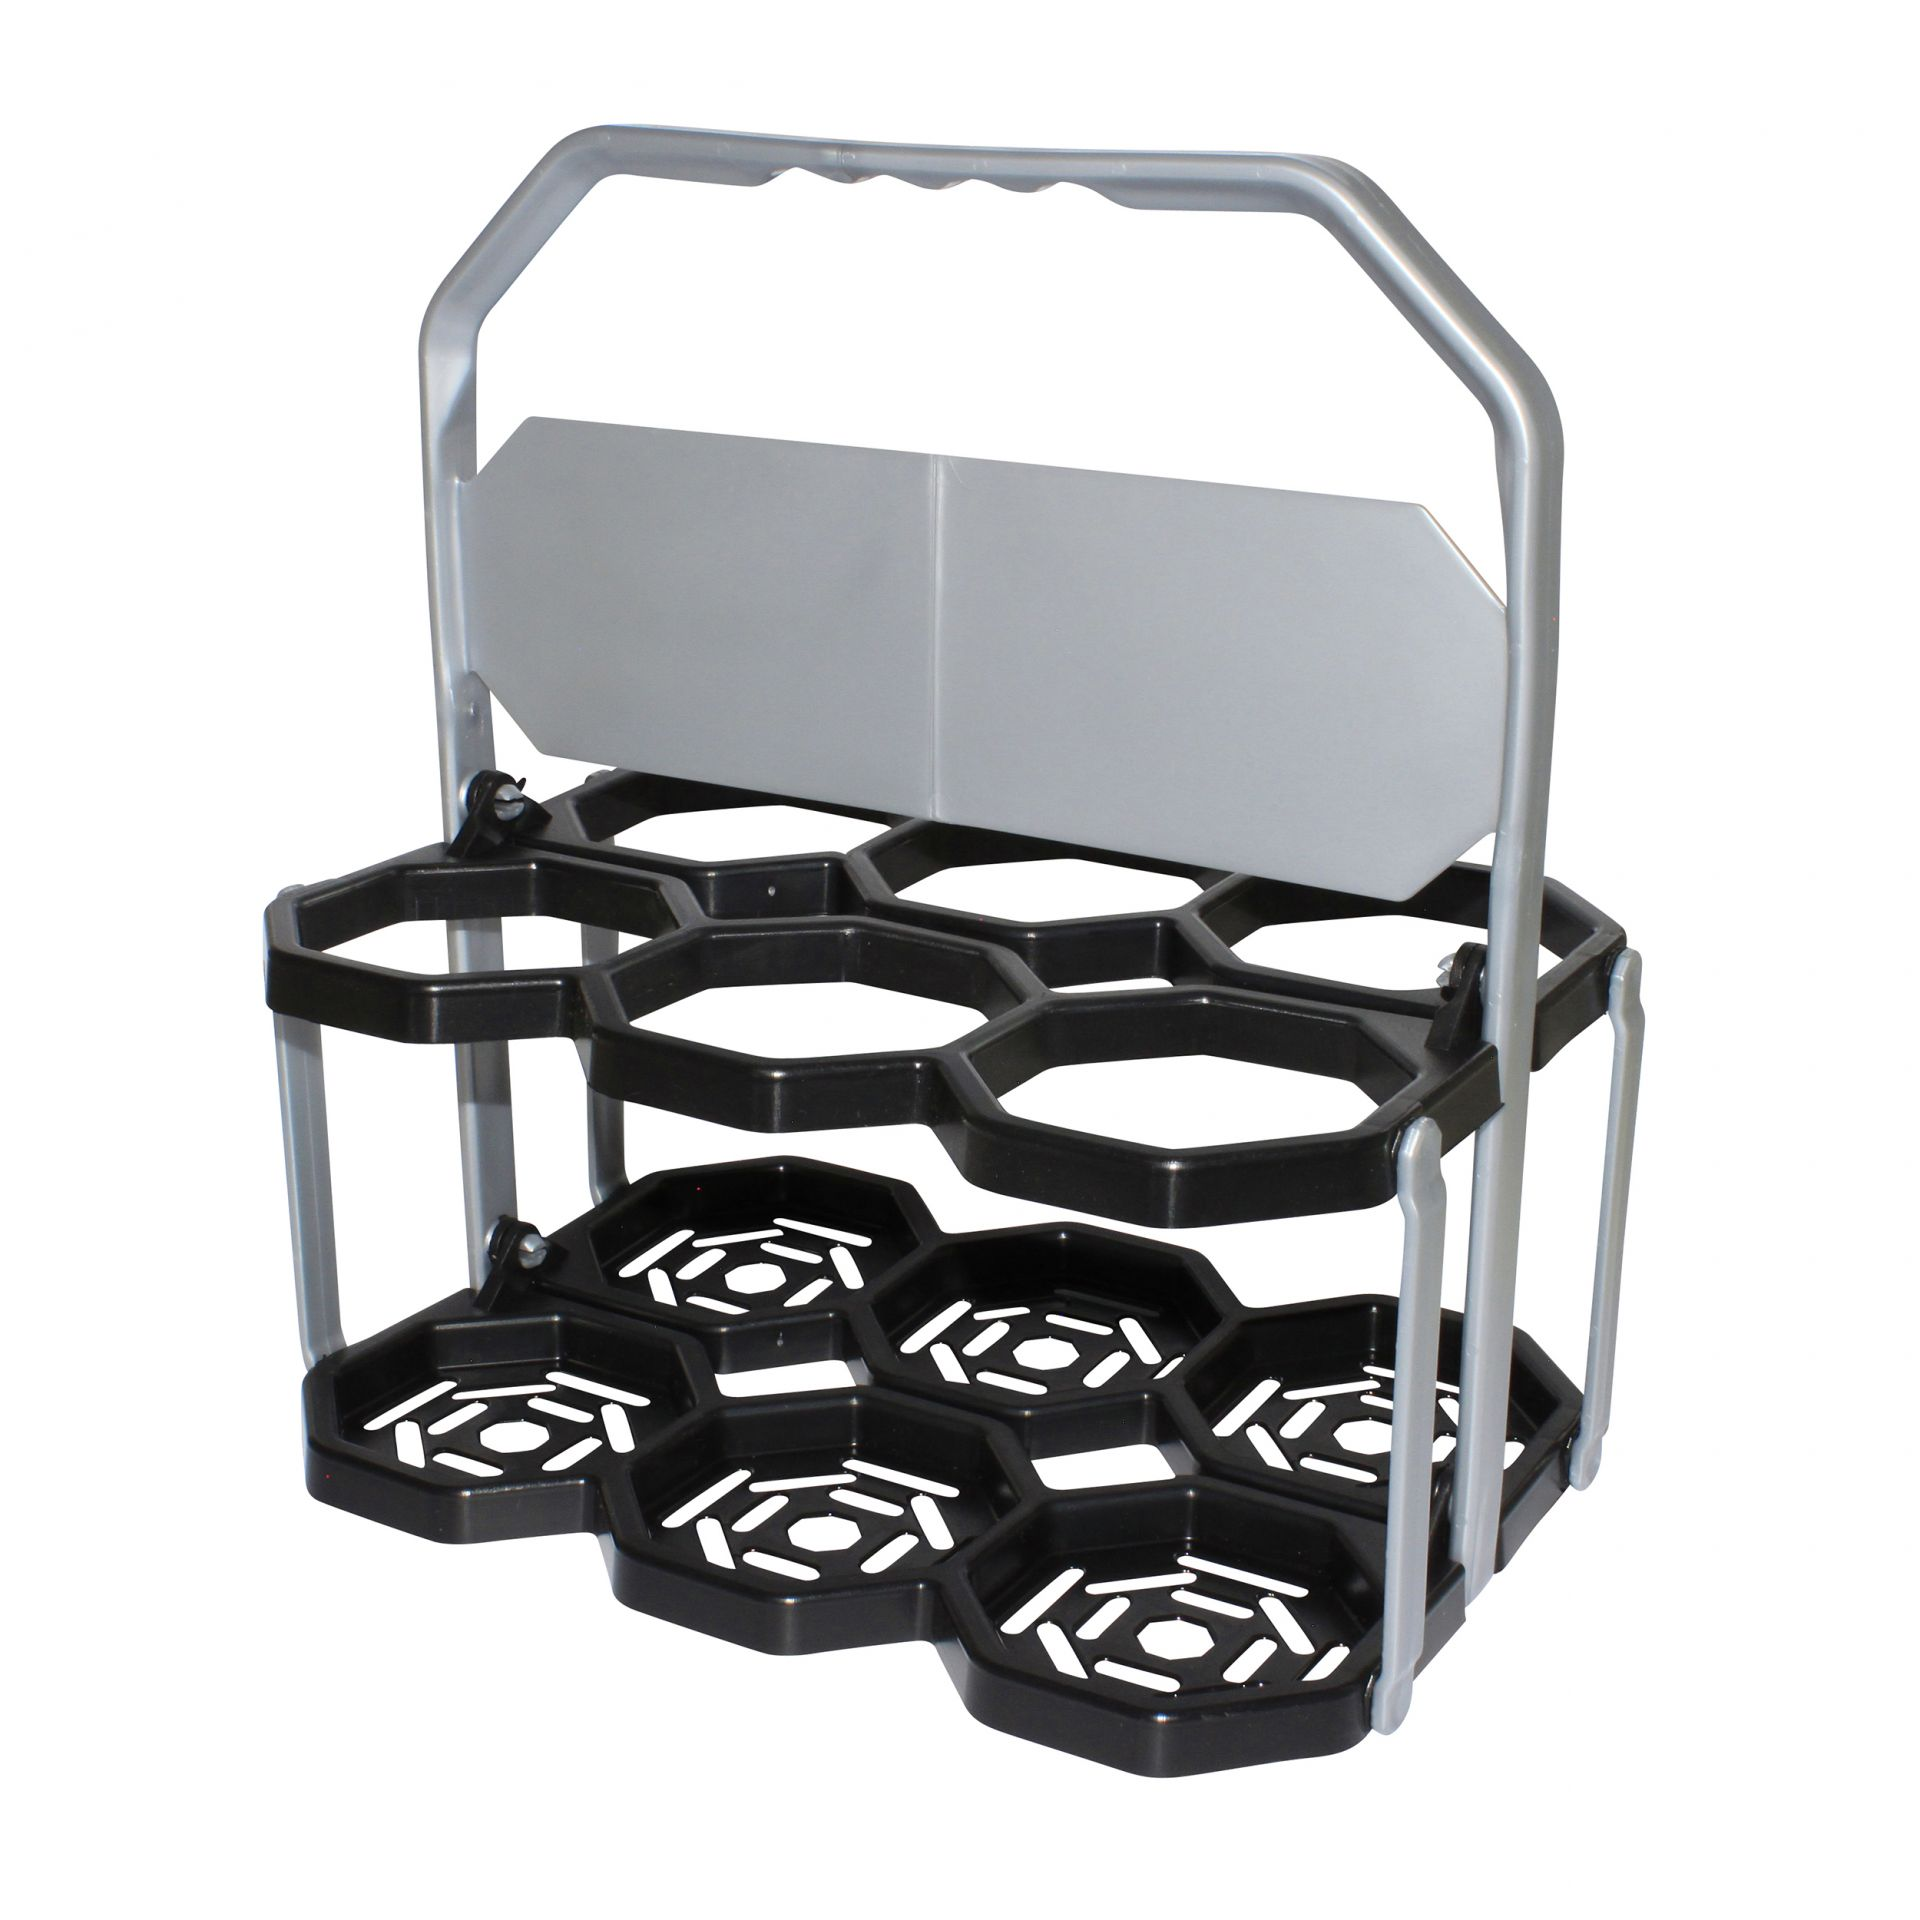 Panier Roto Pliable pour transport de 6 bidons